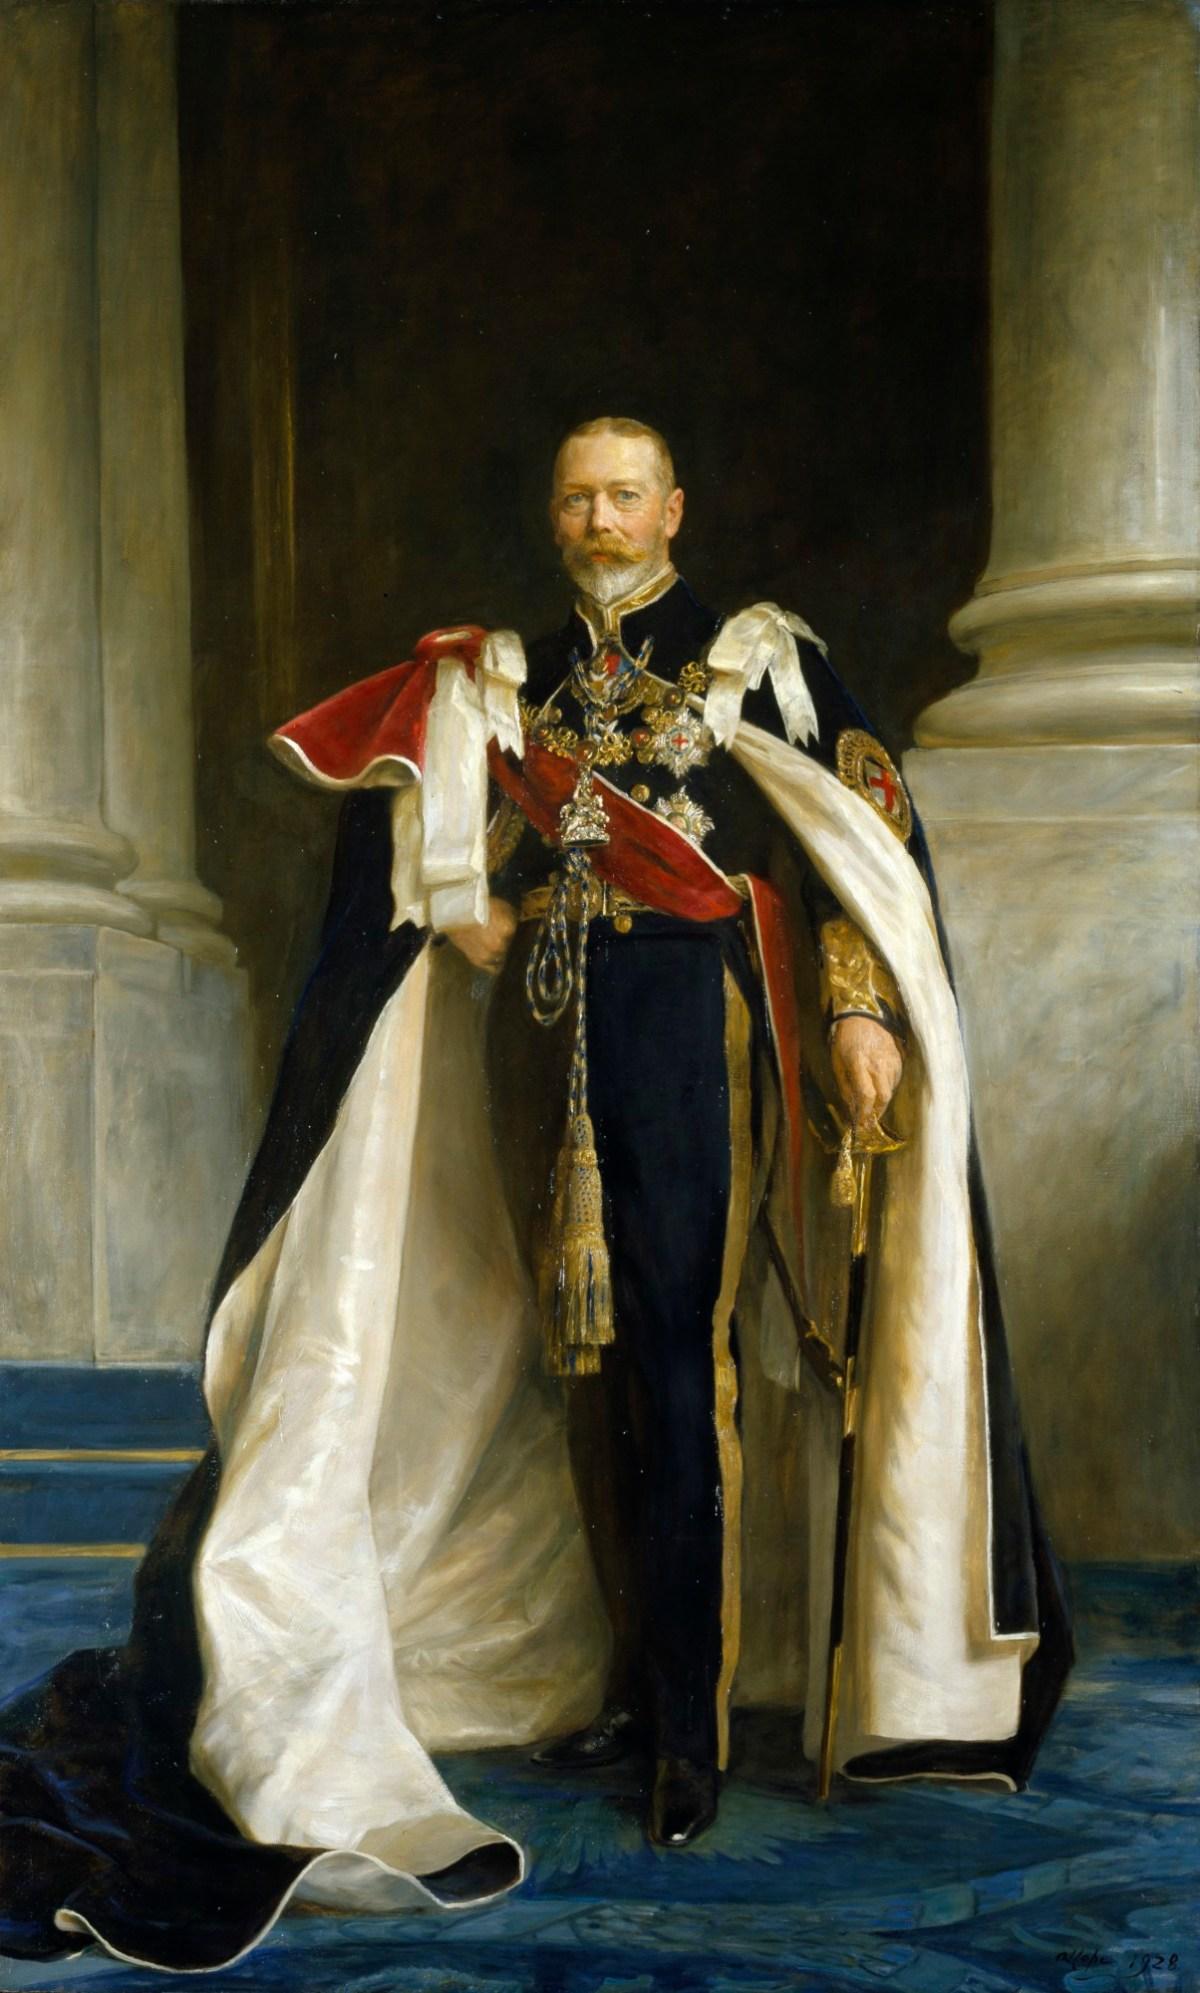 Portrait of King George V | Works of Art | RA Collection ...  Royal